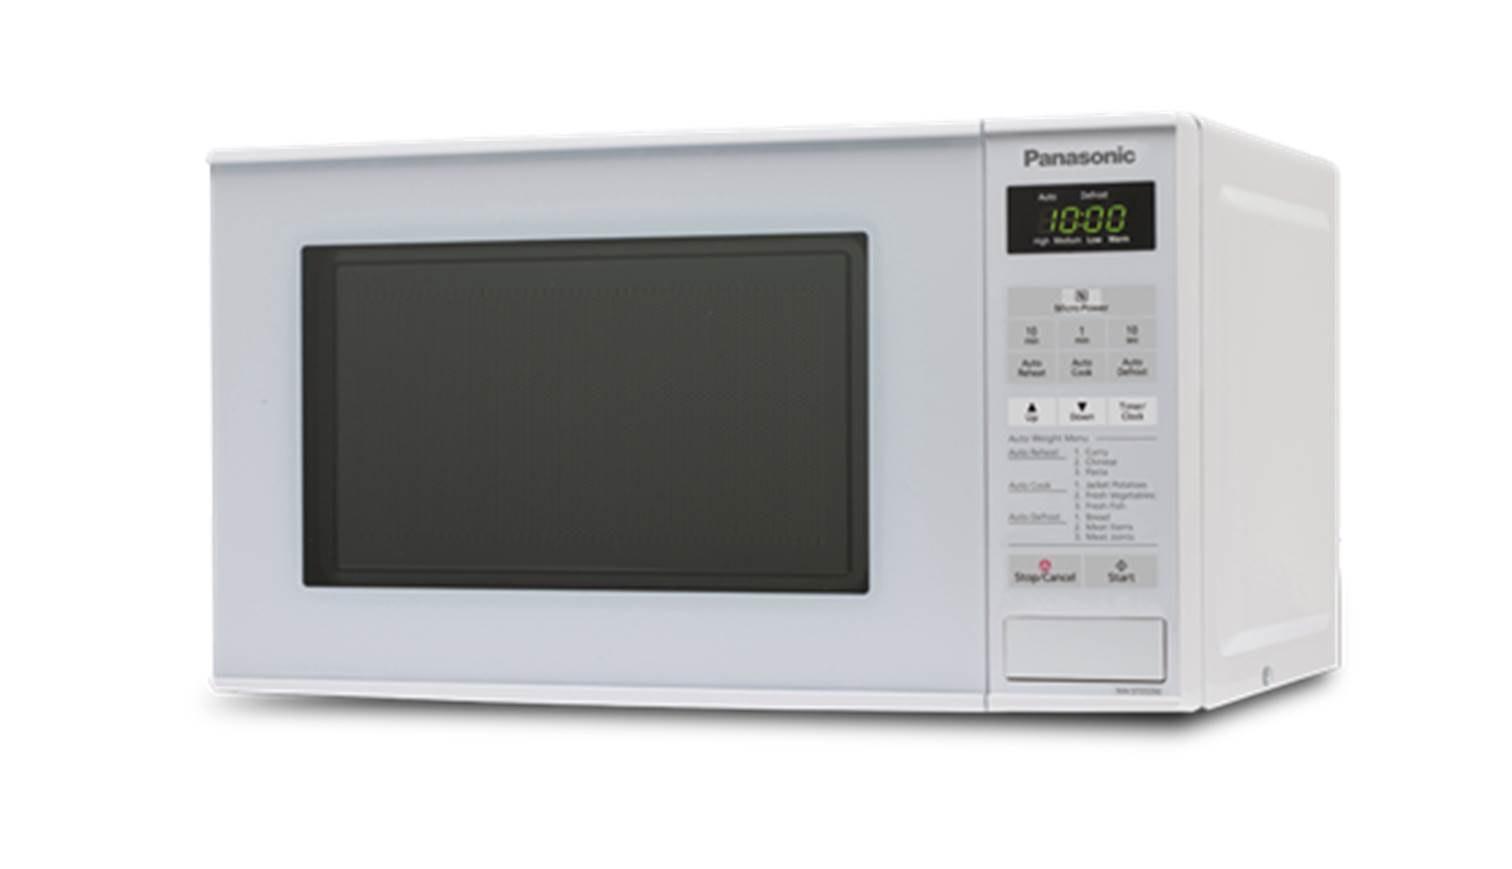 Panasonic NN-ST253WYPQ Microwave Oven | Harvey Norman